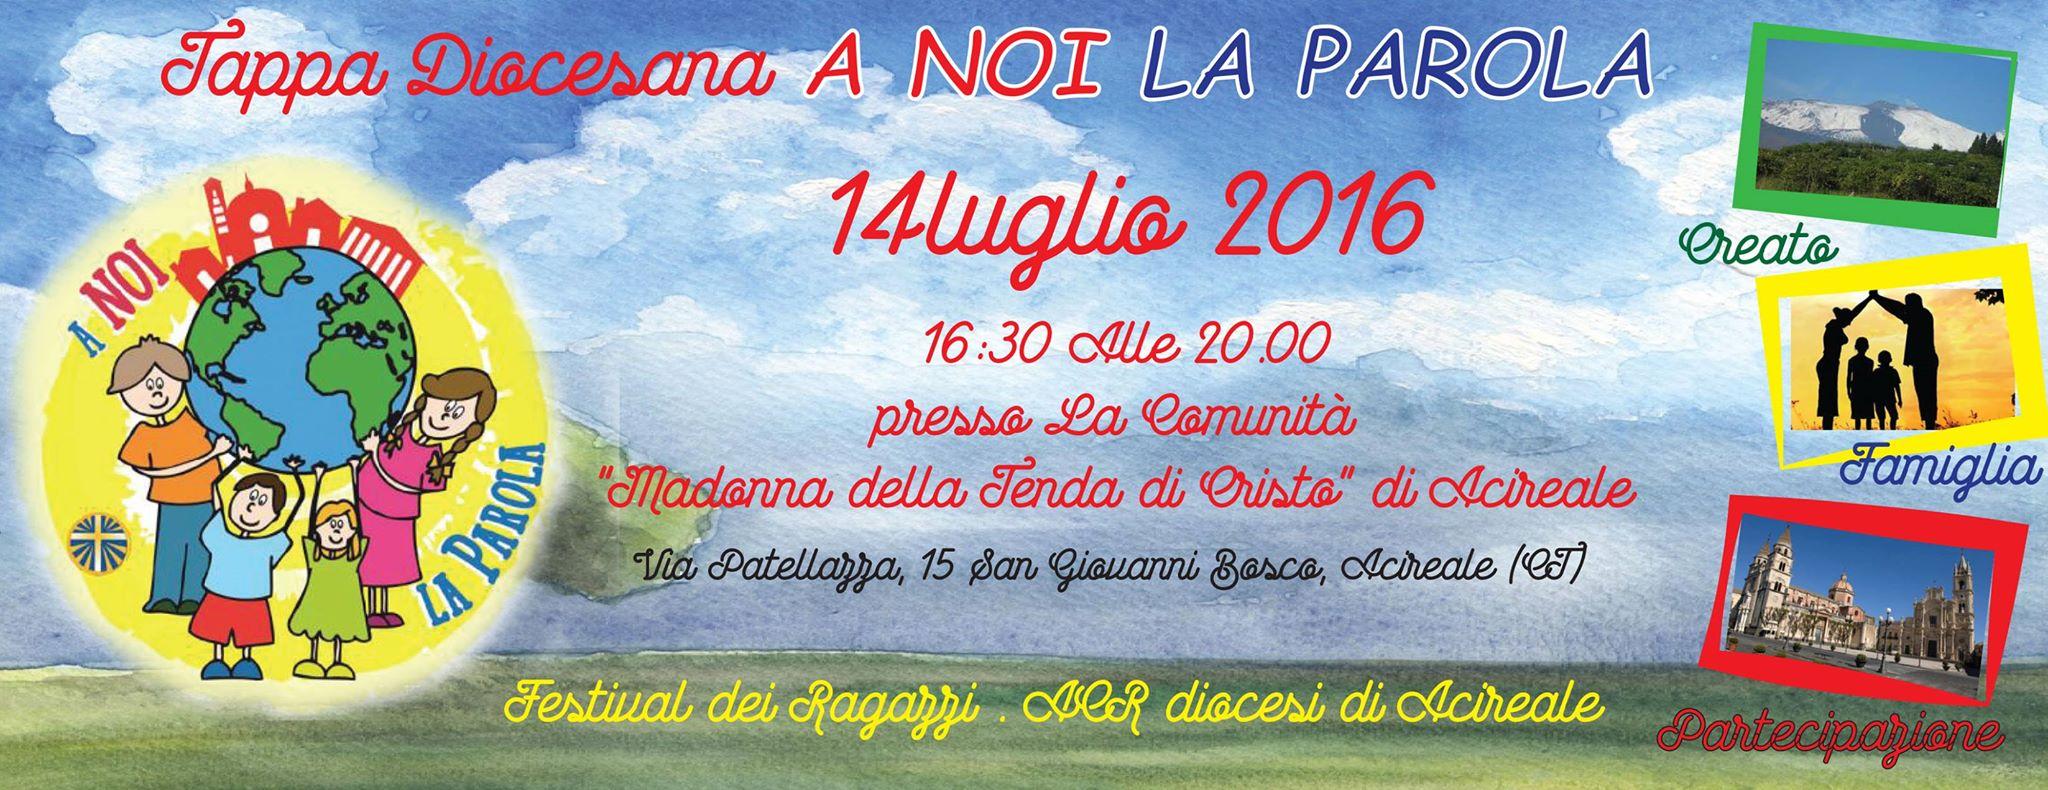 "Tappa Diocesana ""A NOI LA PAROLA"" Festival dei Ragazzi ACR  diocesi di Acireale"